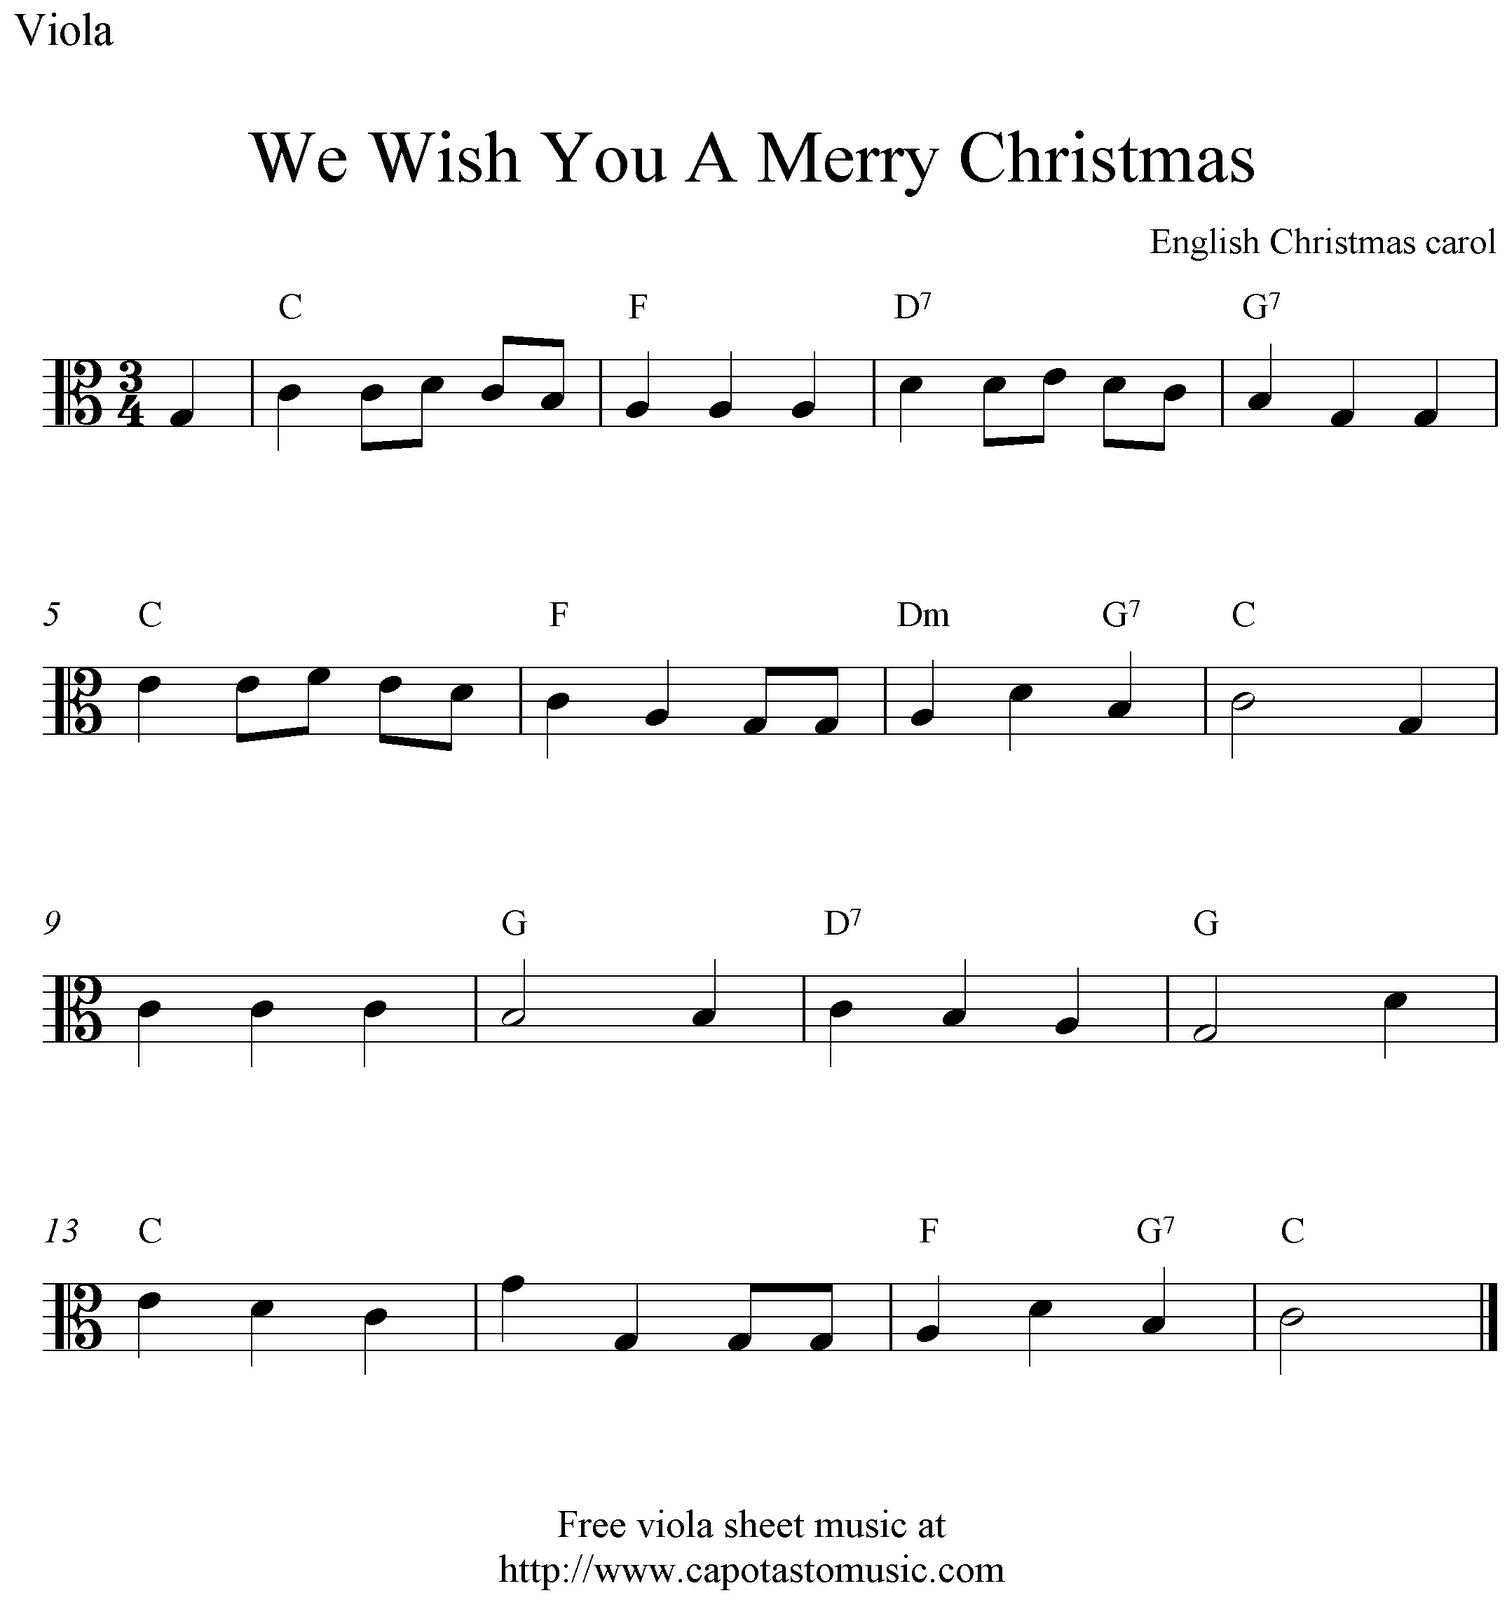 Viola Sheet Music For Christmas | Free Easy Christmas Viola Sheet - Trombone Christmas Sheet Music Free Printable